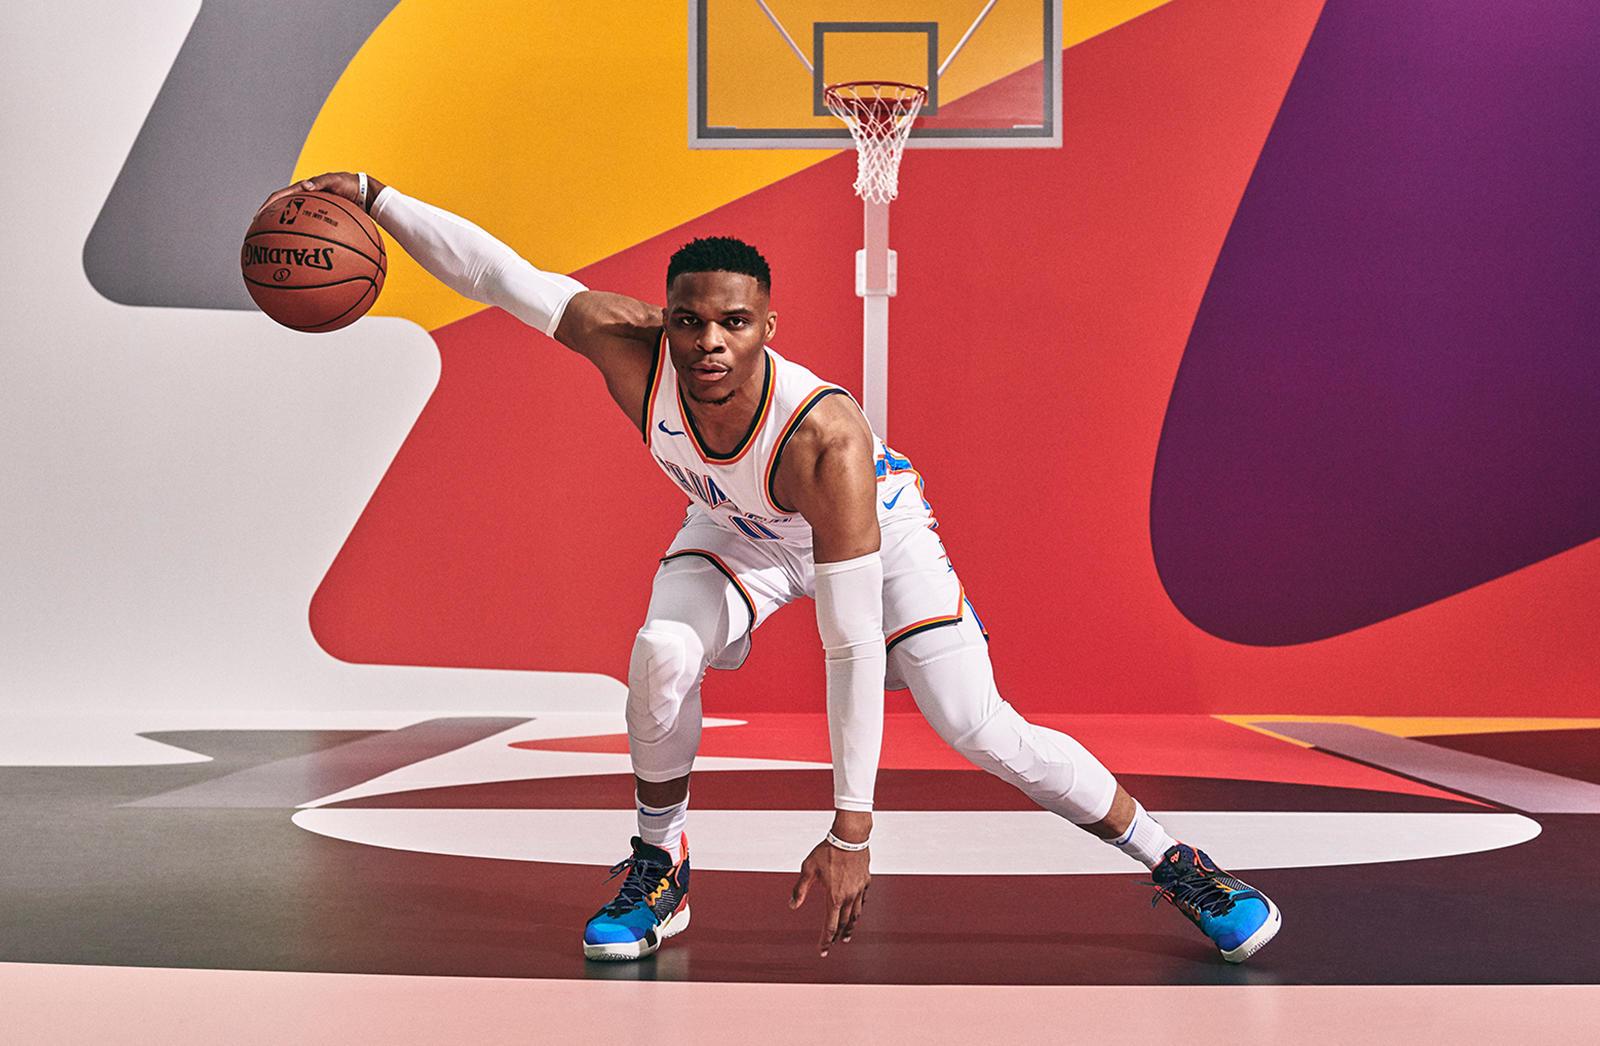 Jordan Westbrook Why Not Zer0.2 - Nike News